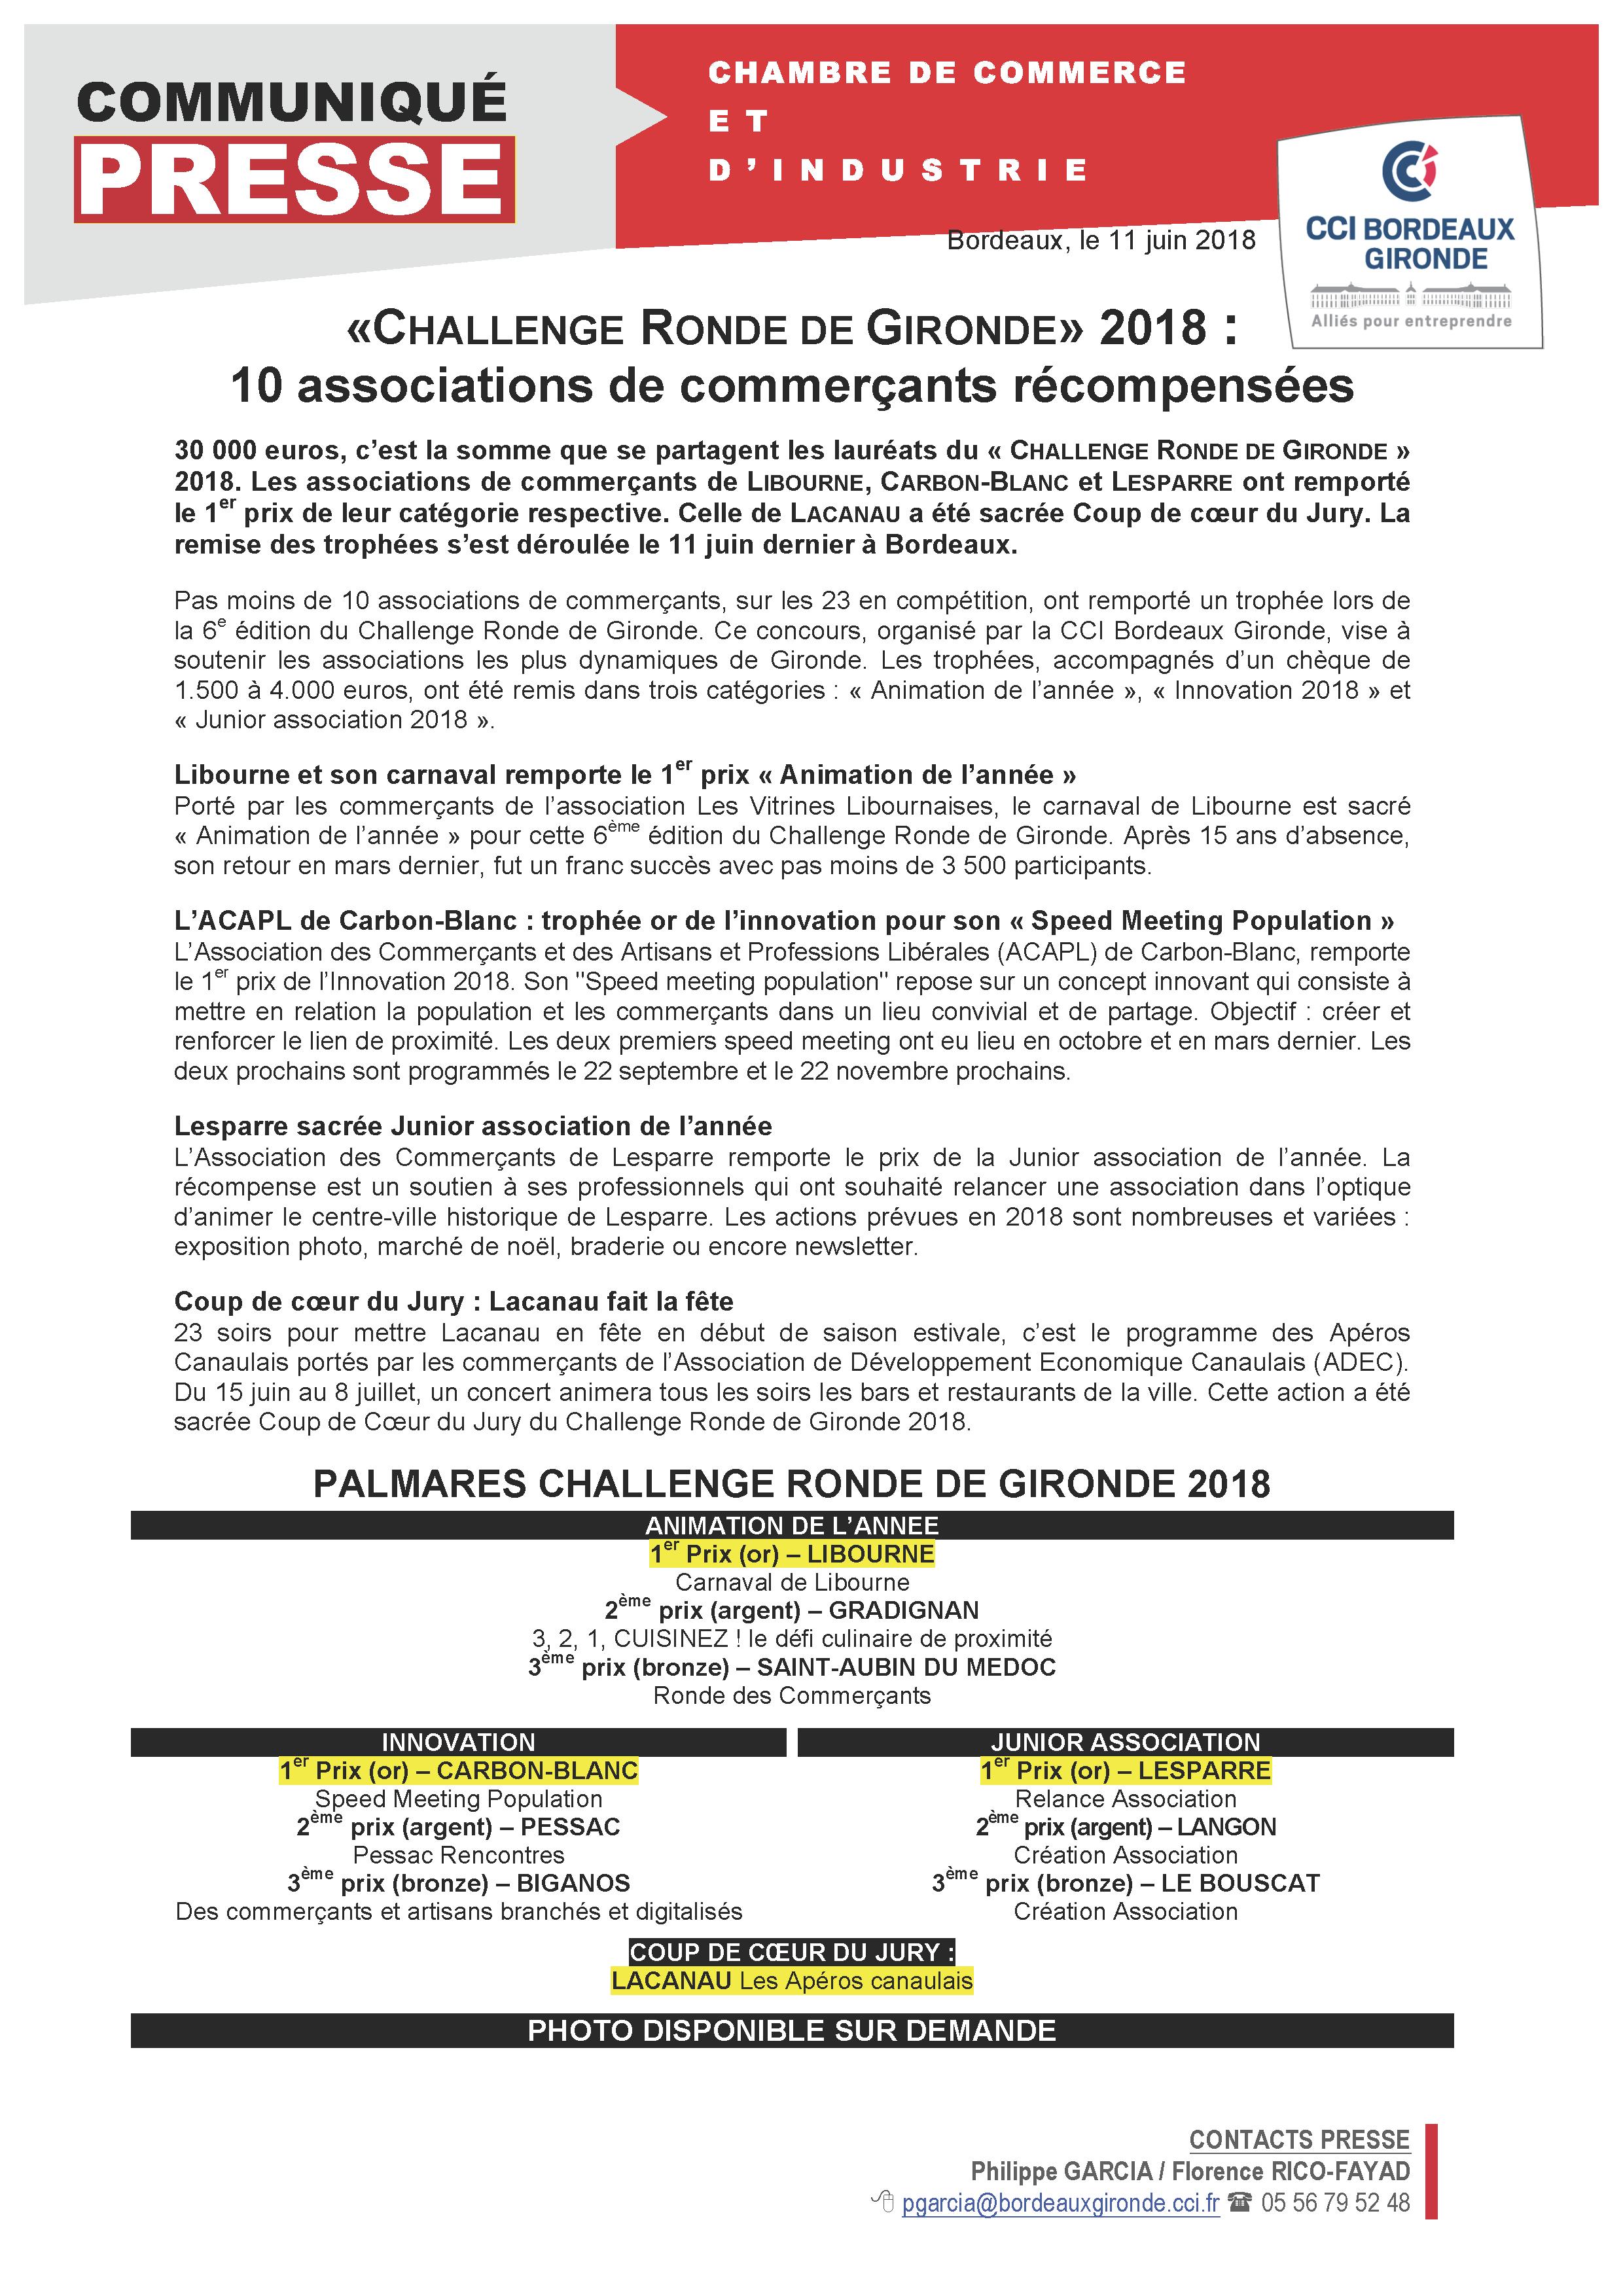 2018-cp-palmares-challenge-ronde-de-gironde-11-06-2018